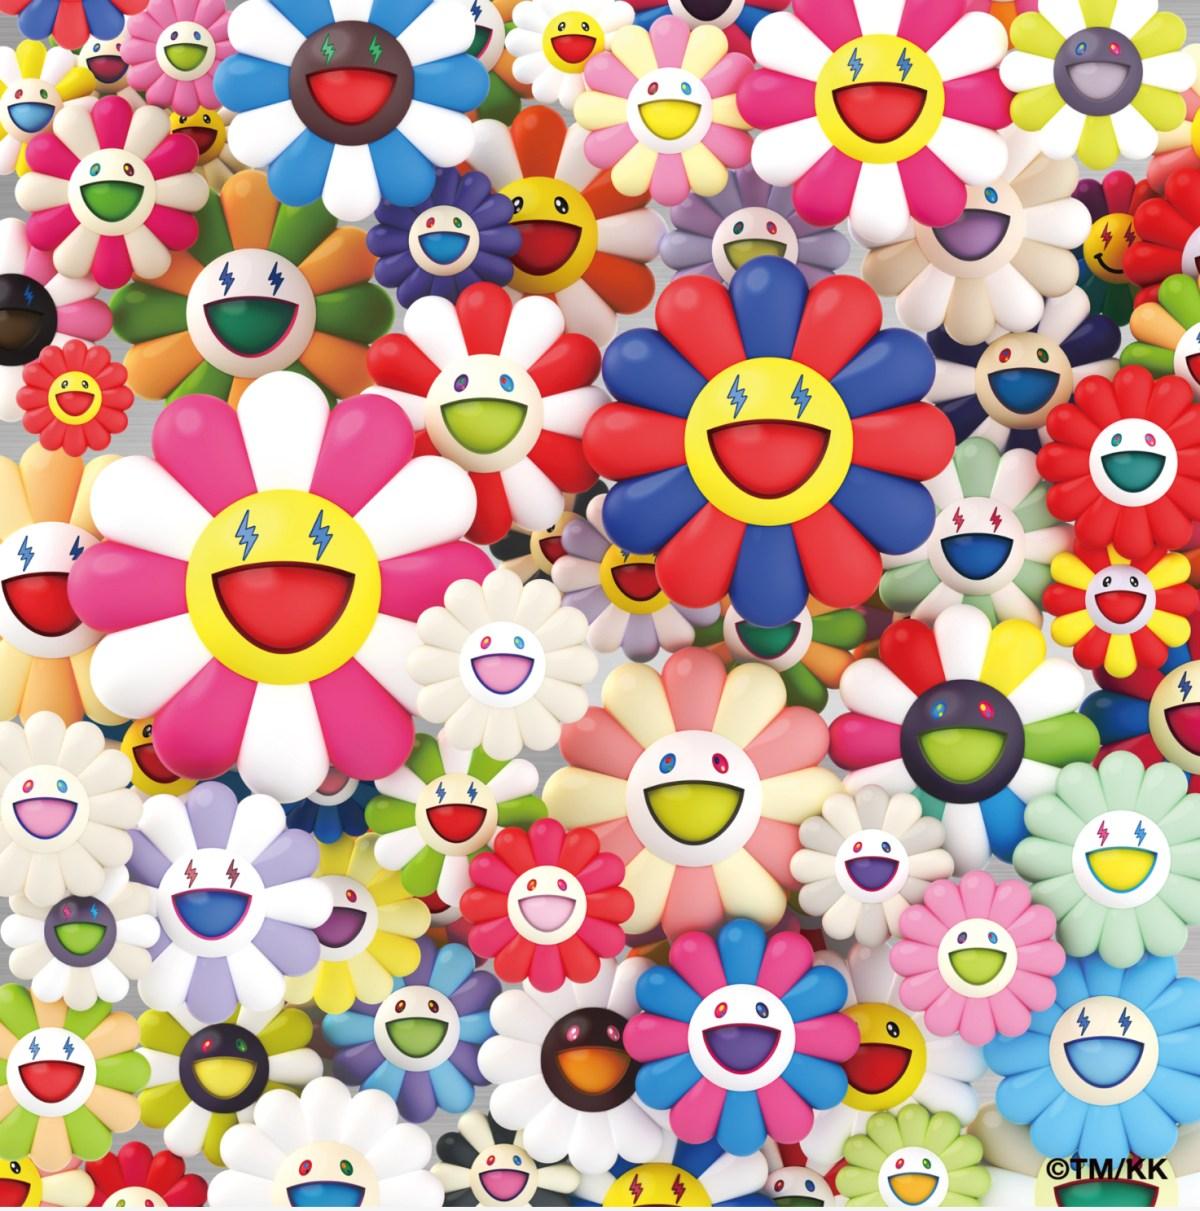 j-balvin-Colores-cover